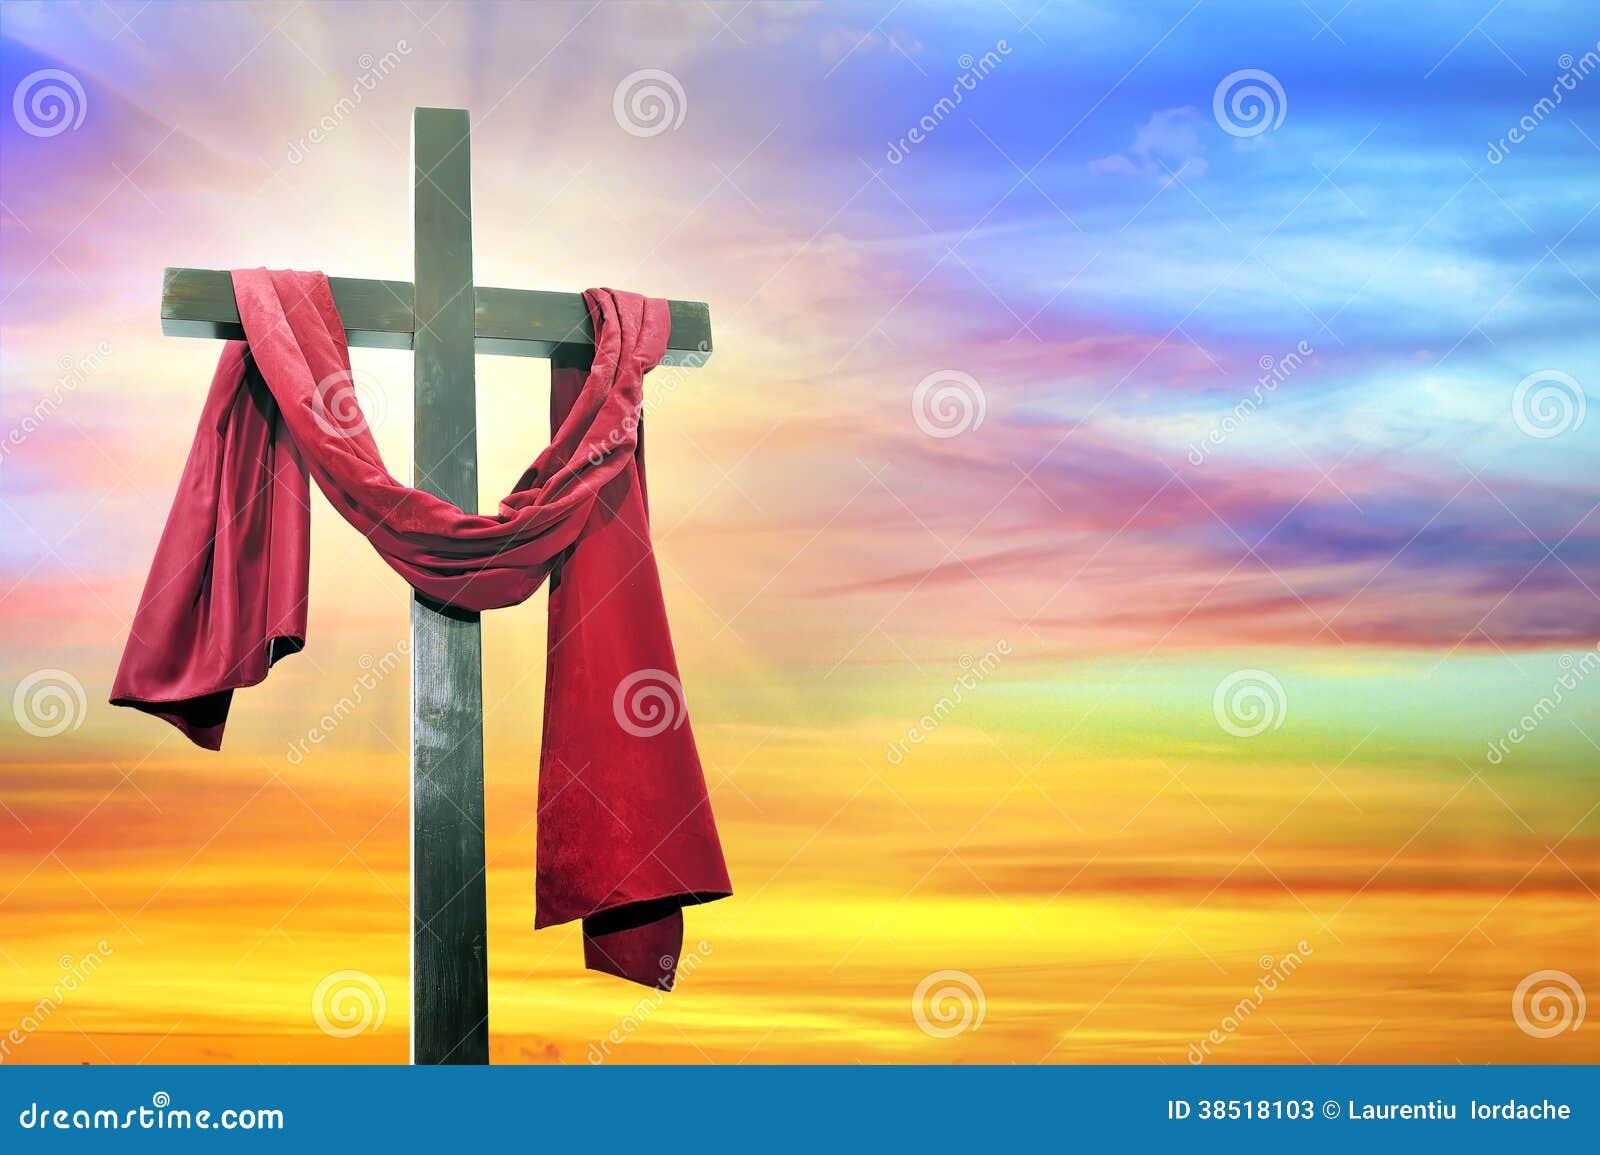 Cross On Sky Background Stock Photos - Image: 38518103